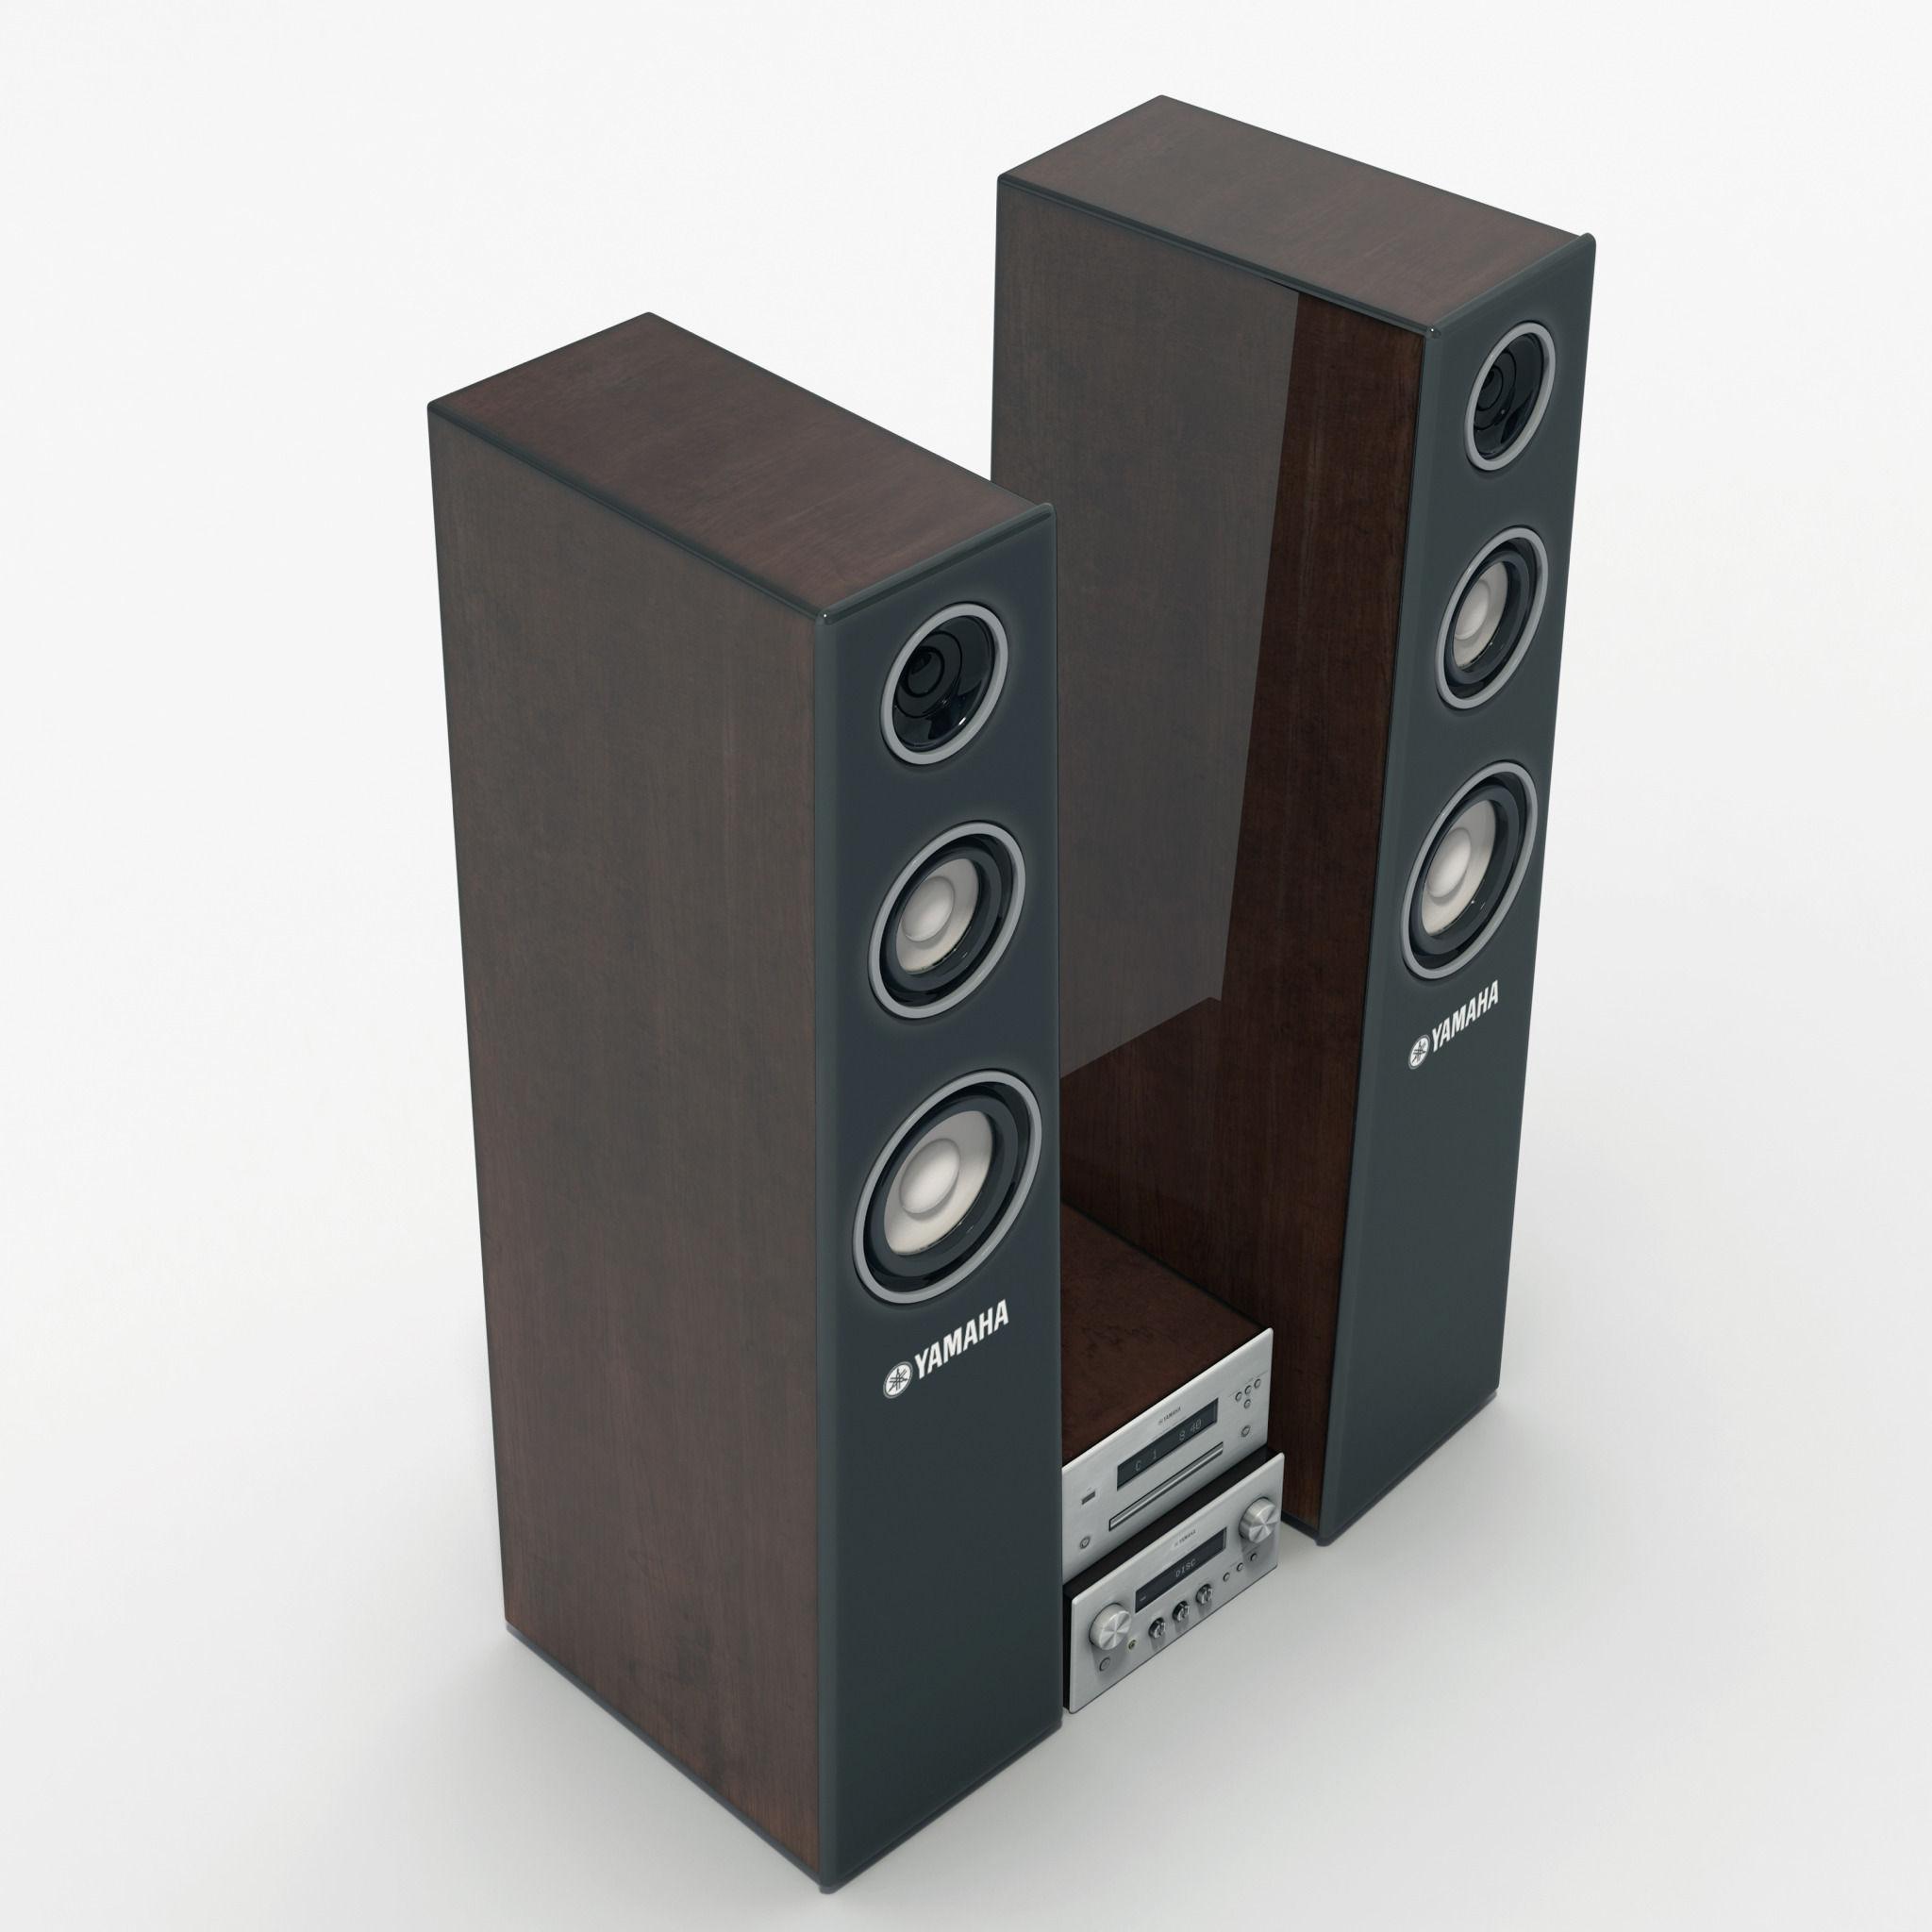 Yamaha Audio Electronics Jobs